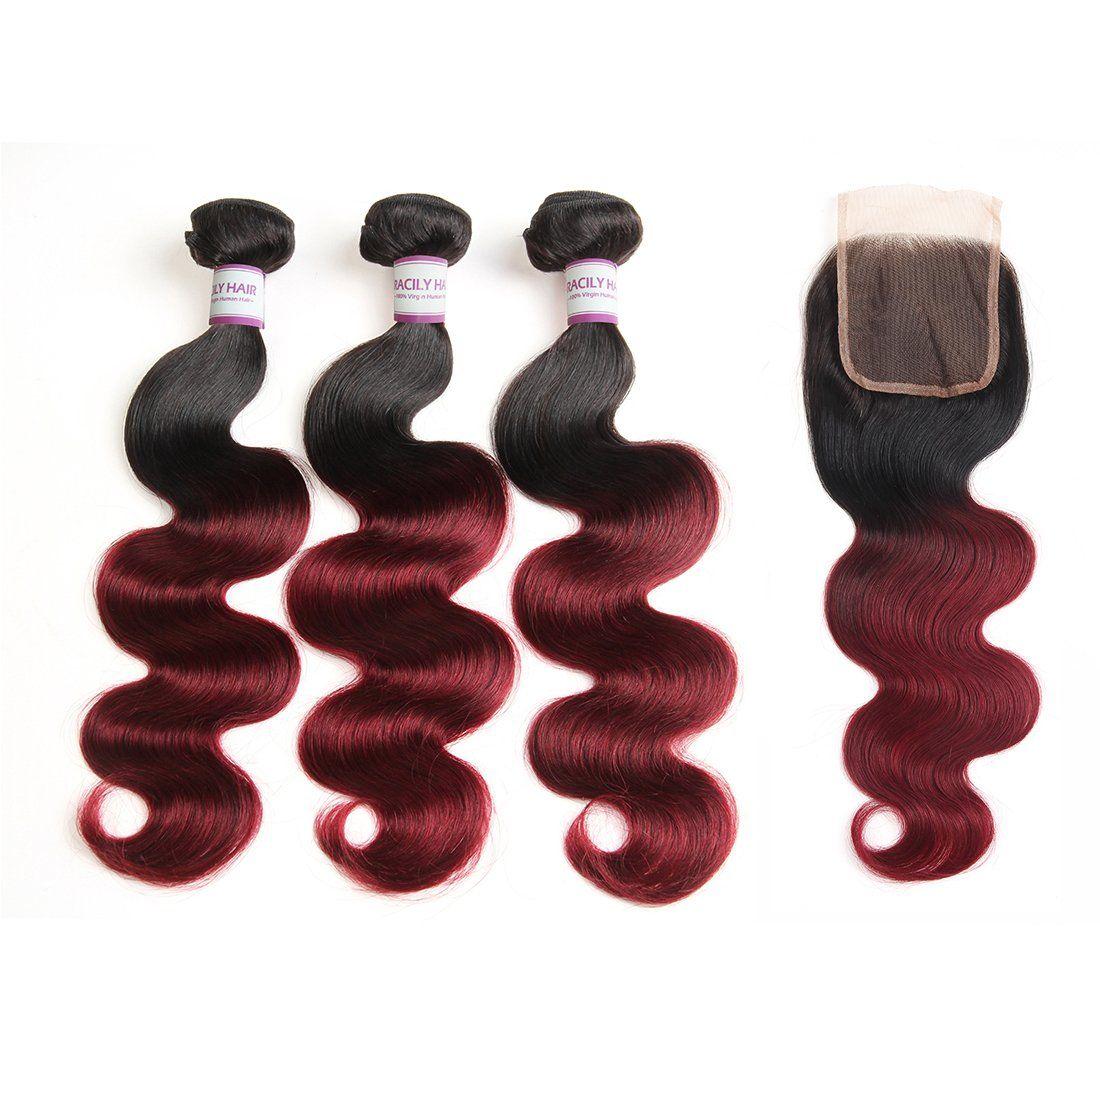 Racily Hair Ombre Brazilian Hair Body Wave 3 Bundles 1b Burgundy